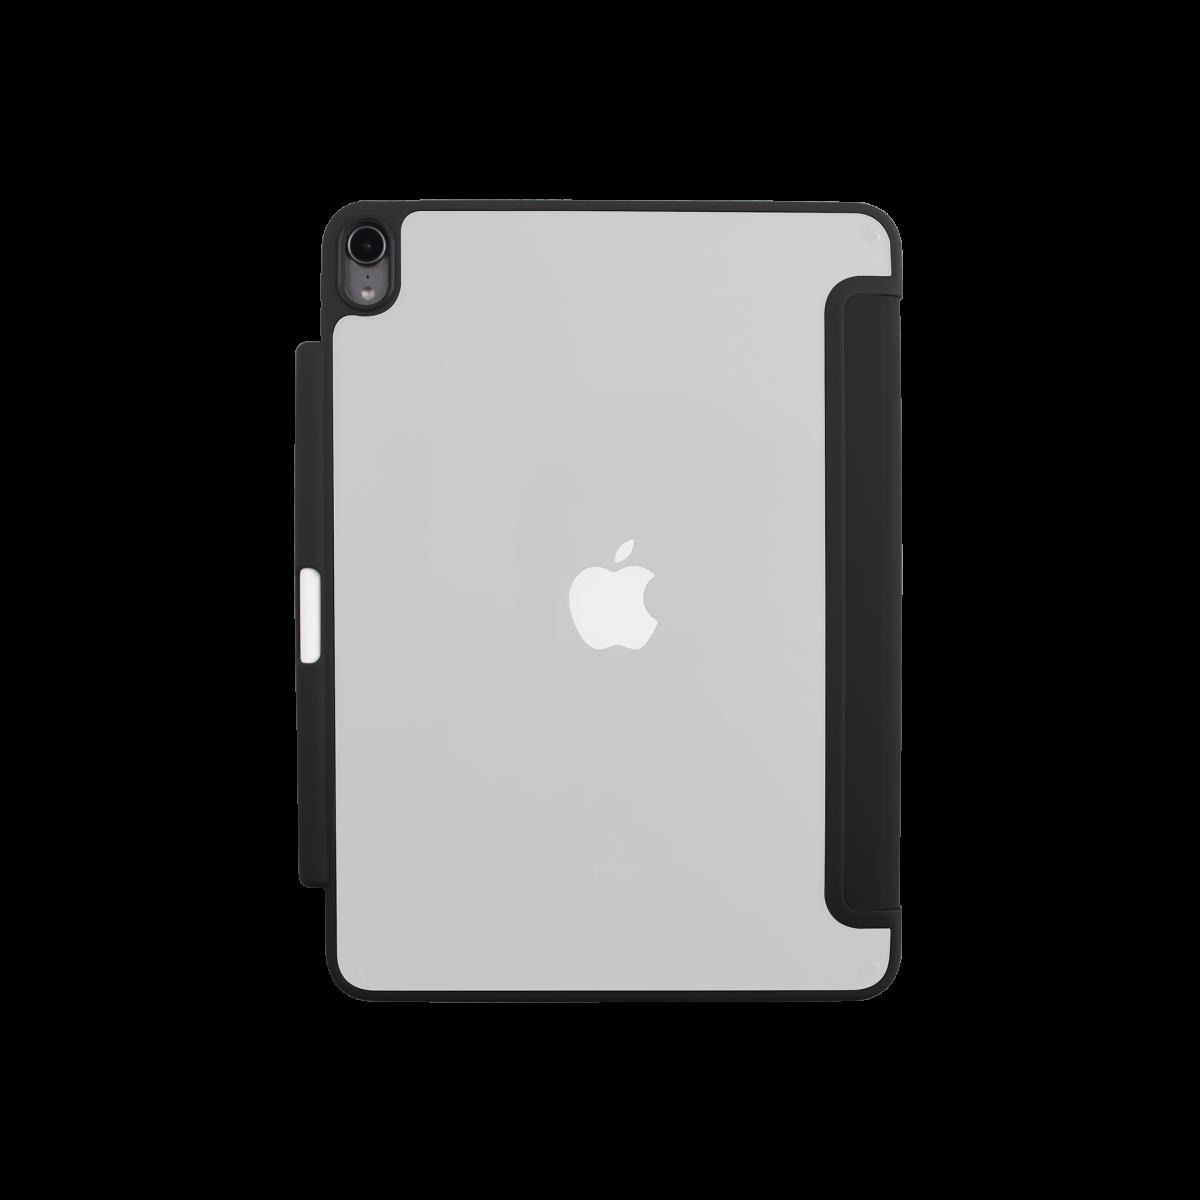 کاور سیلیکونی آیپد ایر ۱۰.۹ اینچ